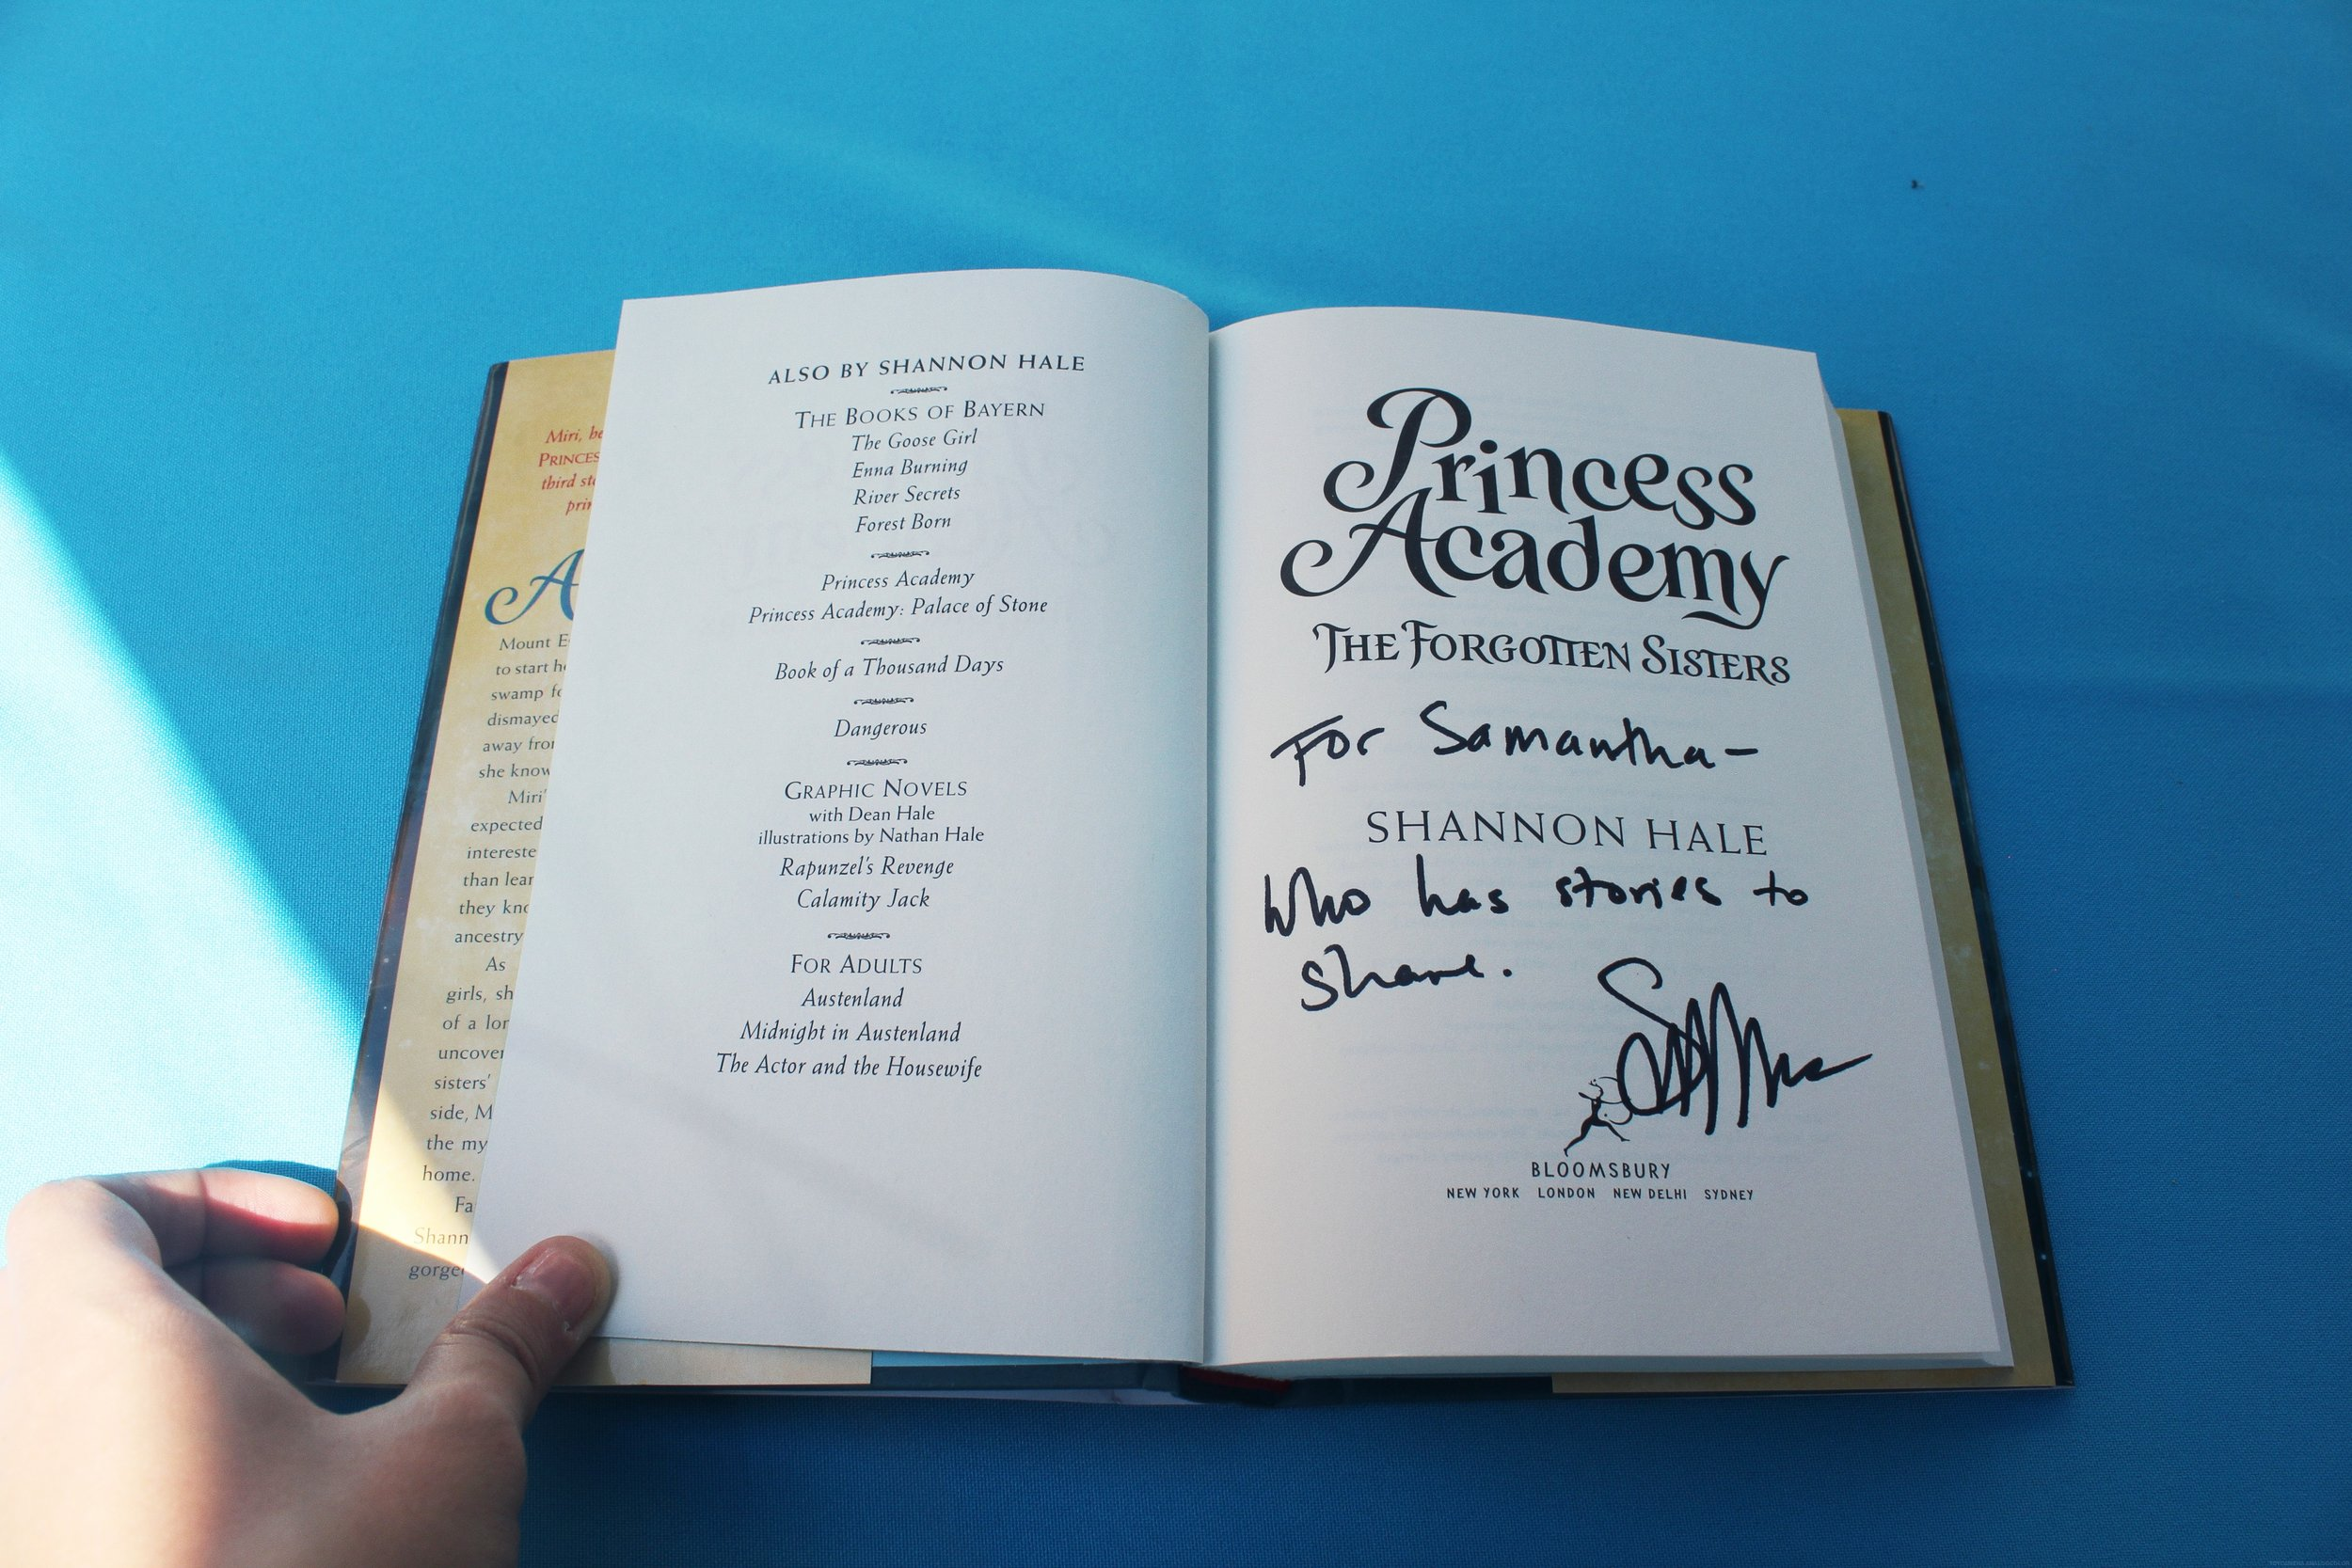 Princess Academy signed